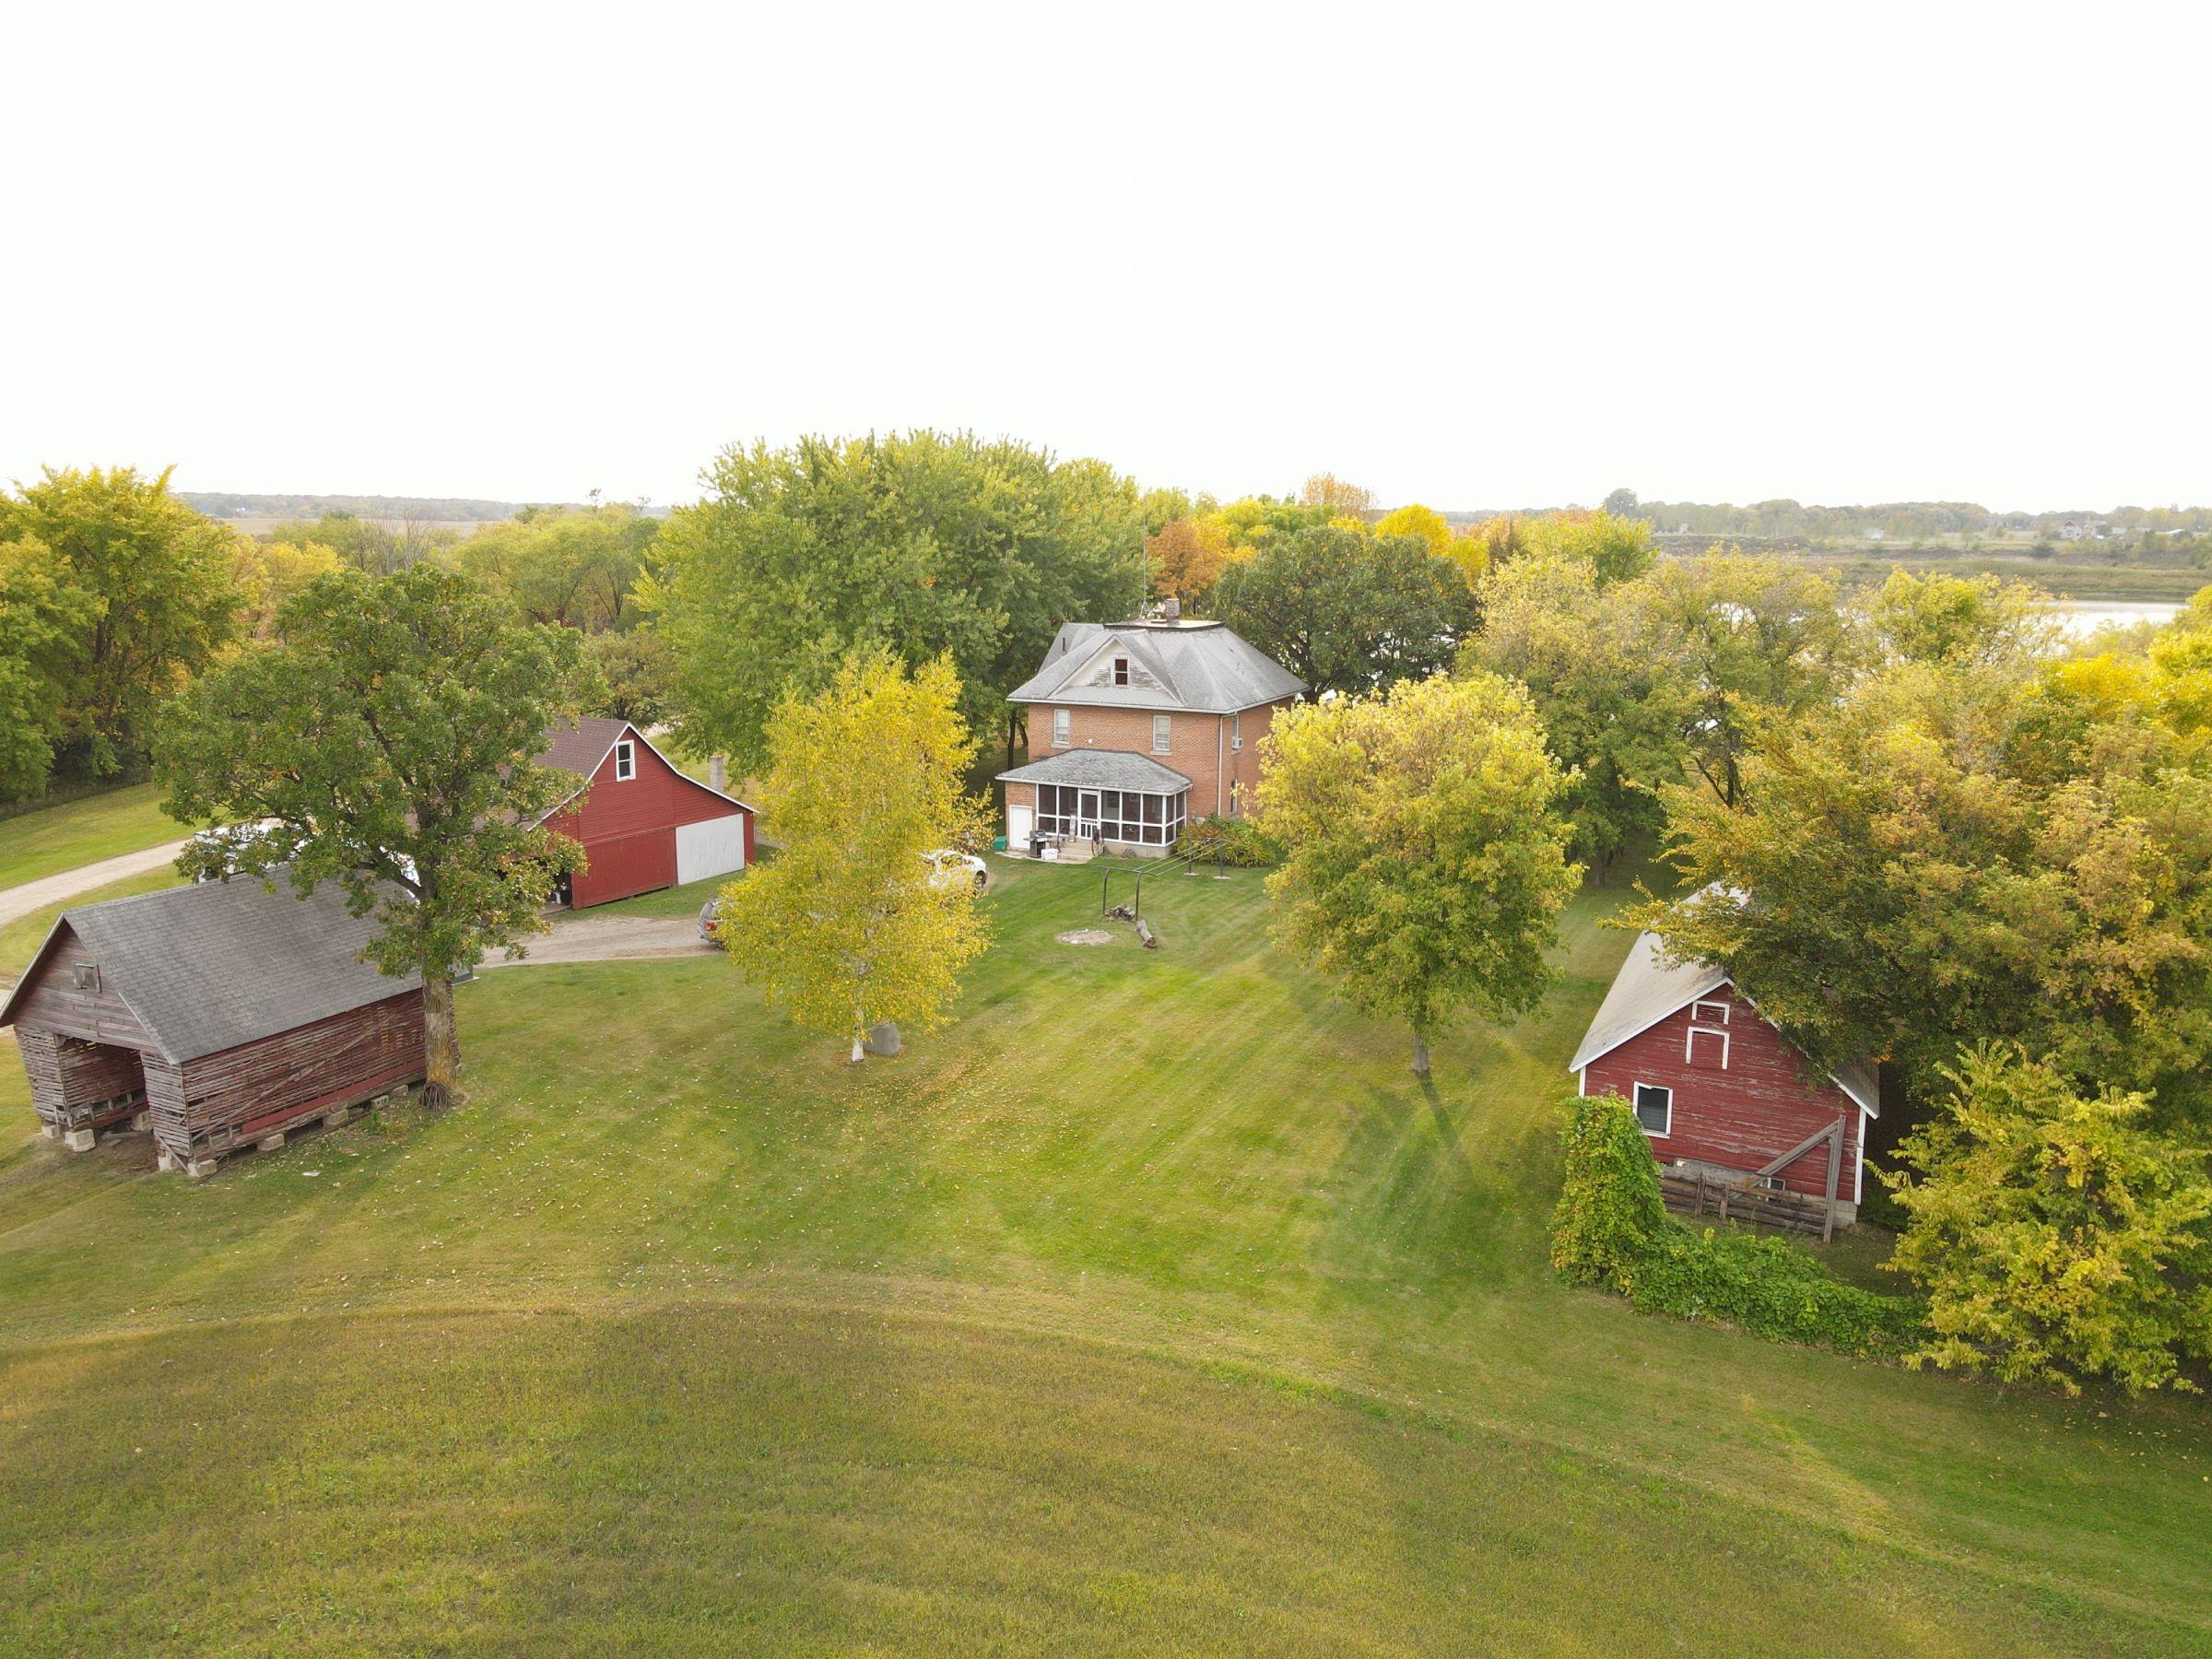 residential-land-mcleod-county-minnesota-80-acres-listing-number-15182-2-2020-10-07-142929.JPG